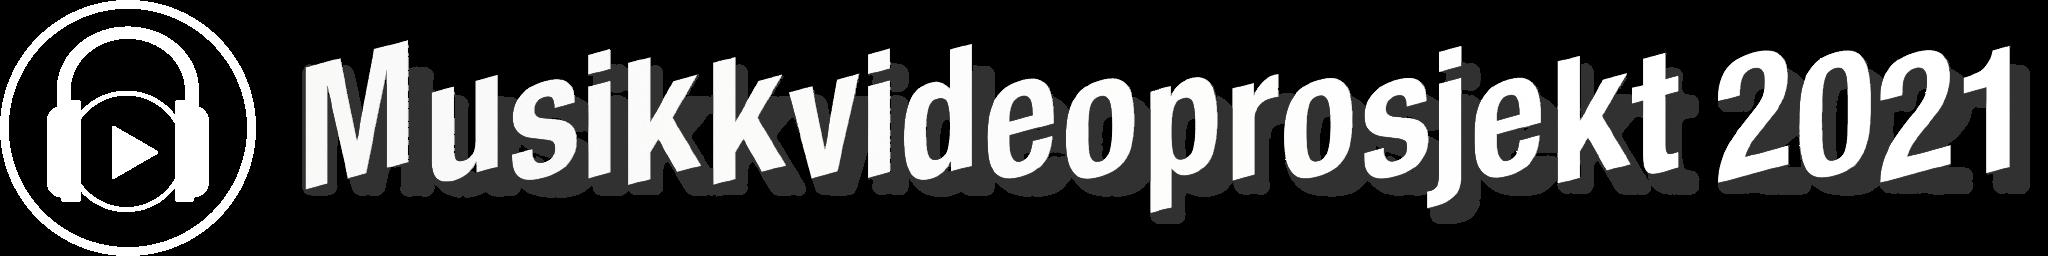 Musikkvideoprosjekt 2021